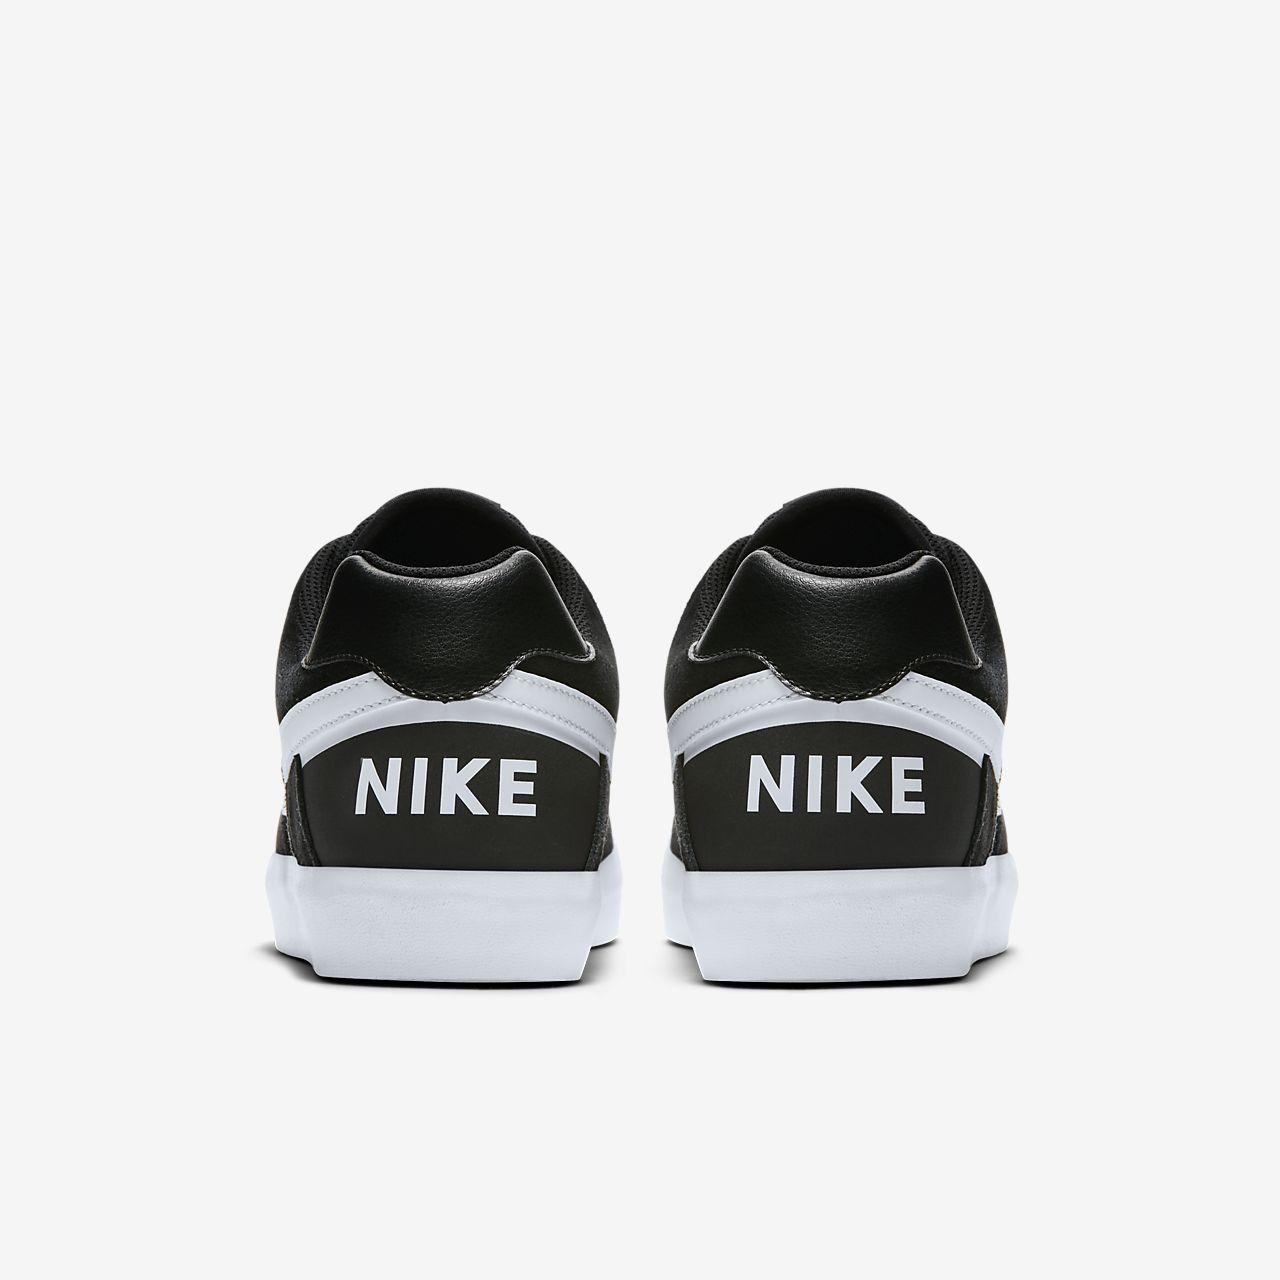 Skateboarding Sb Force Men's Nike Vulc Shoe Delta c54ARLq3j